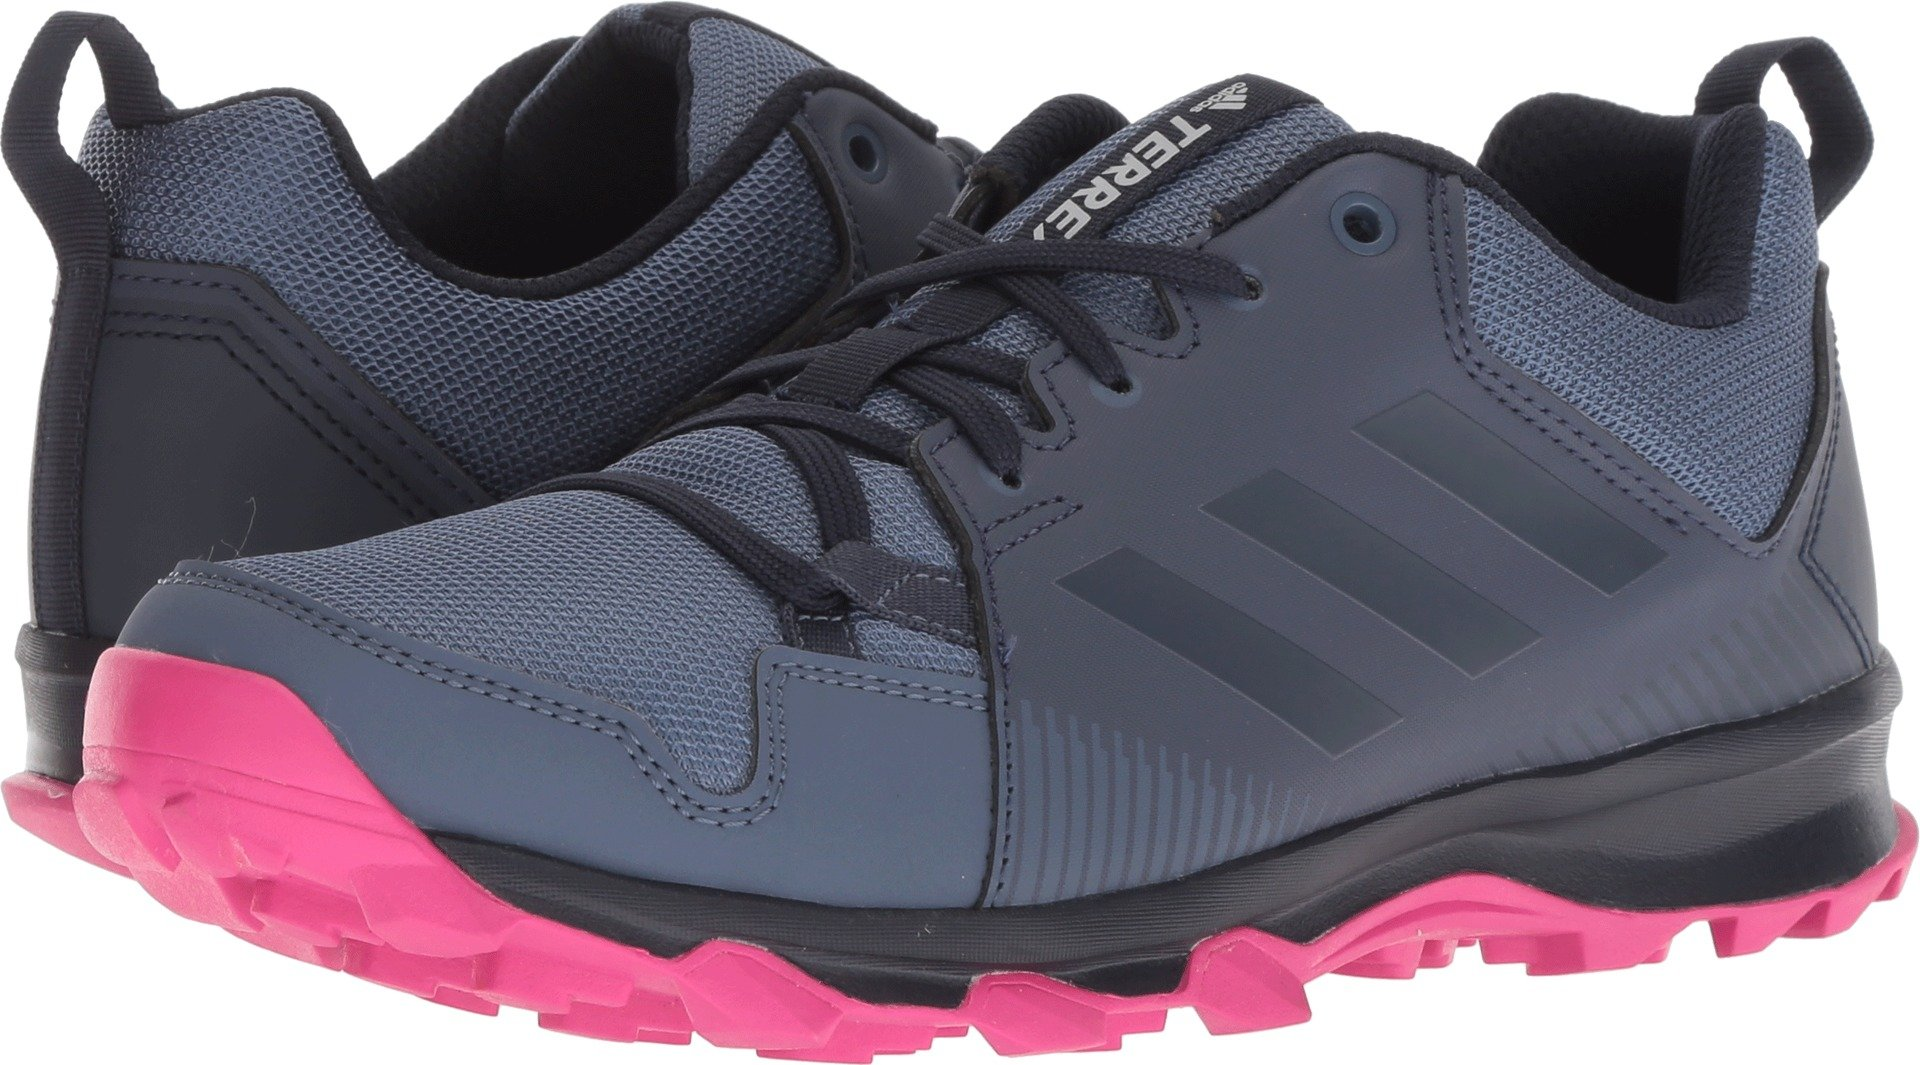 adidas outdoor Women's Terrex Tracerocker Tech Ink/Trace Blue/Real Magenta 6.5 B US